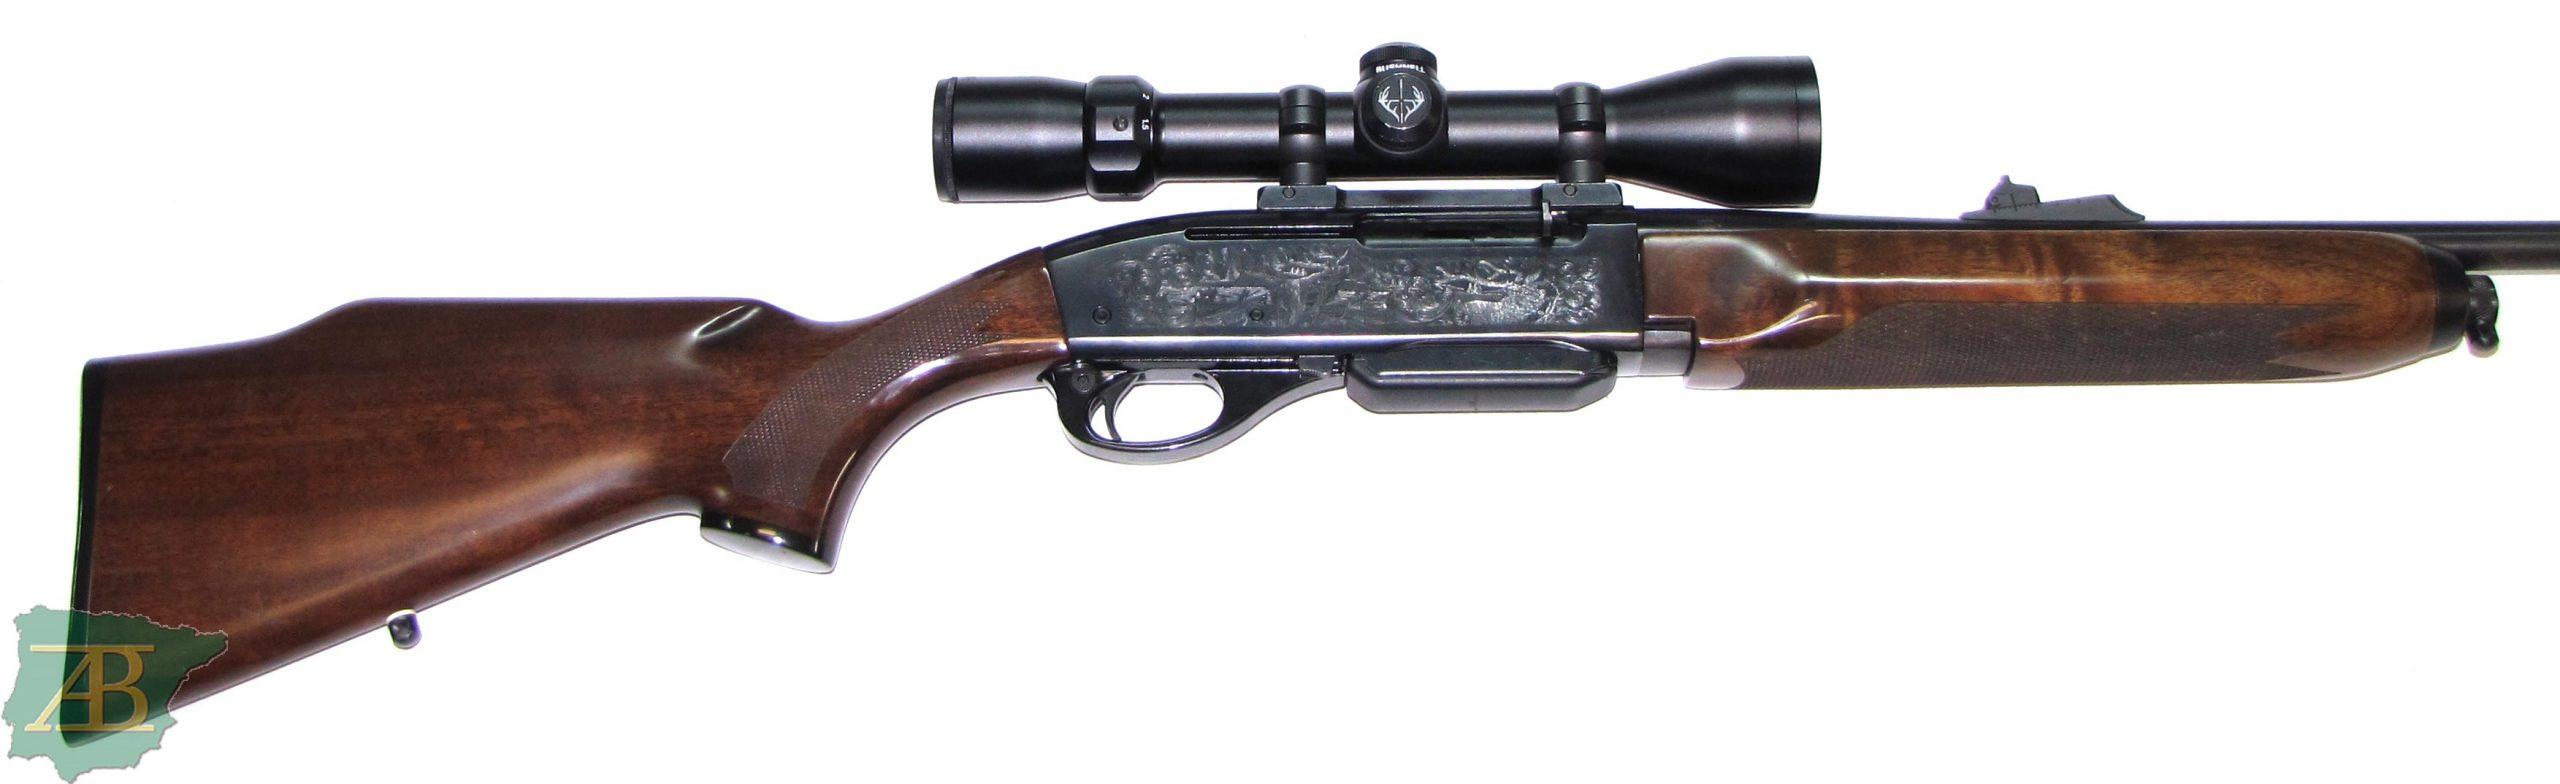 Rifle semiautomático de caza REMINGTON 7400 Ref REP2020-1034-armeriaiberica-2